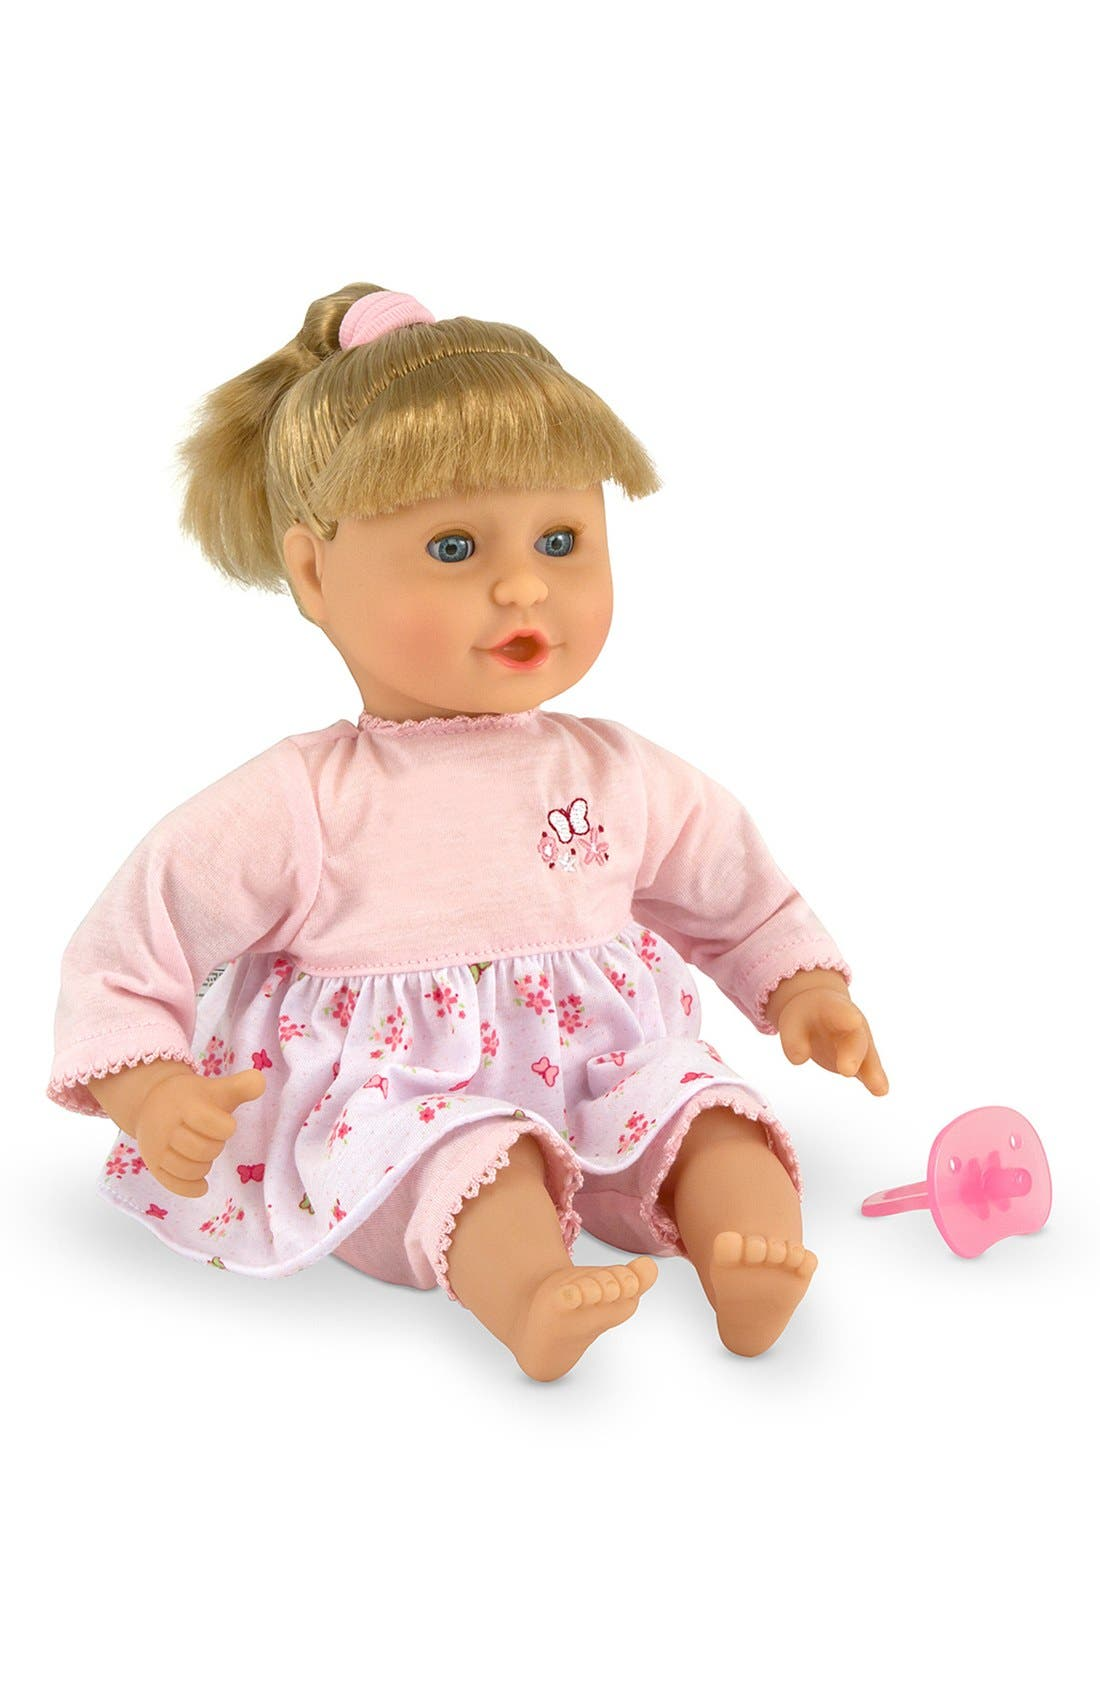 Melissa & Doug 'Mine to Love - Natalie' Doll